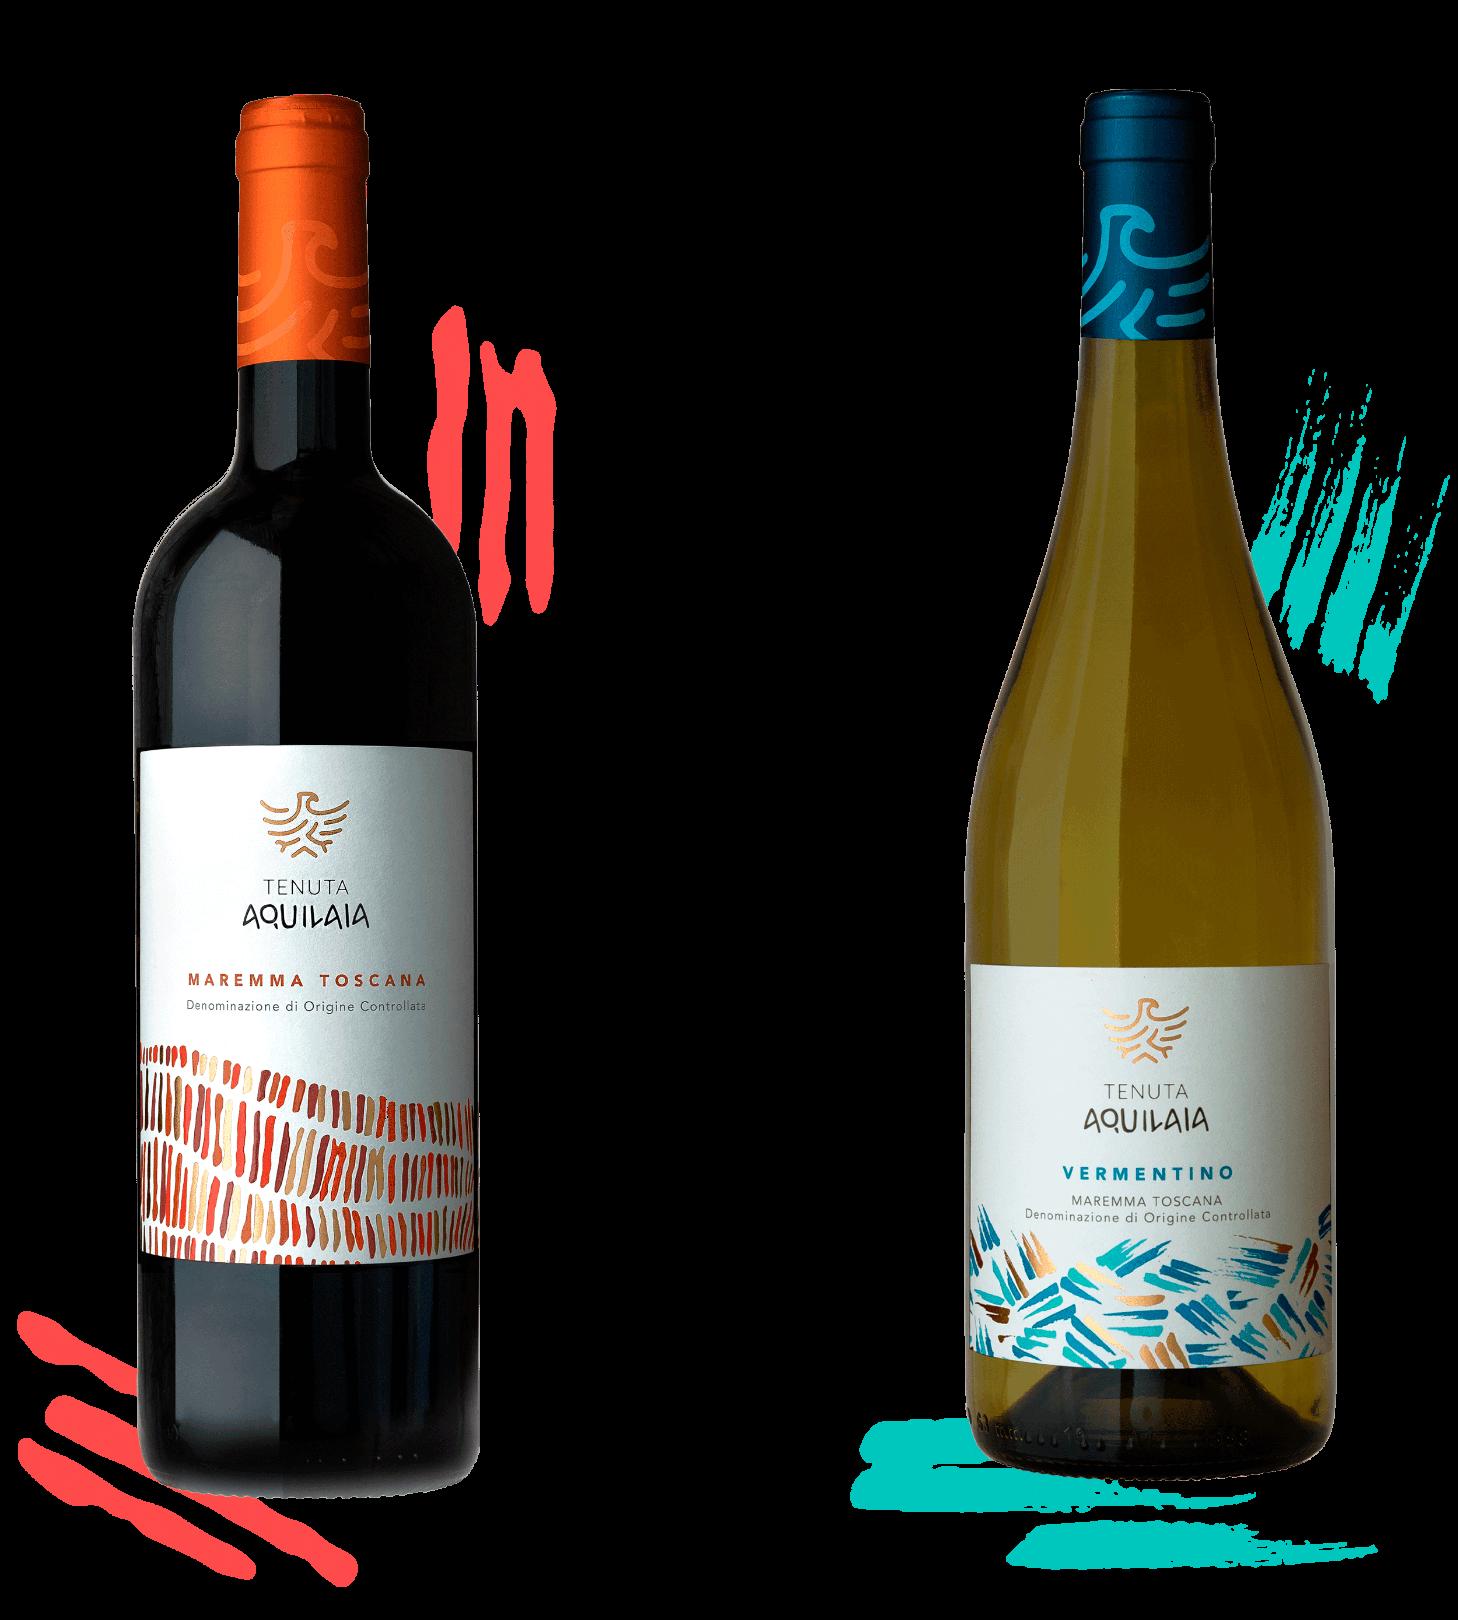 aquilaia-wines-orizzonti-maremma-toscana